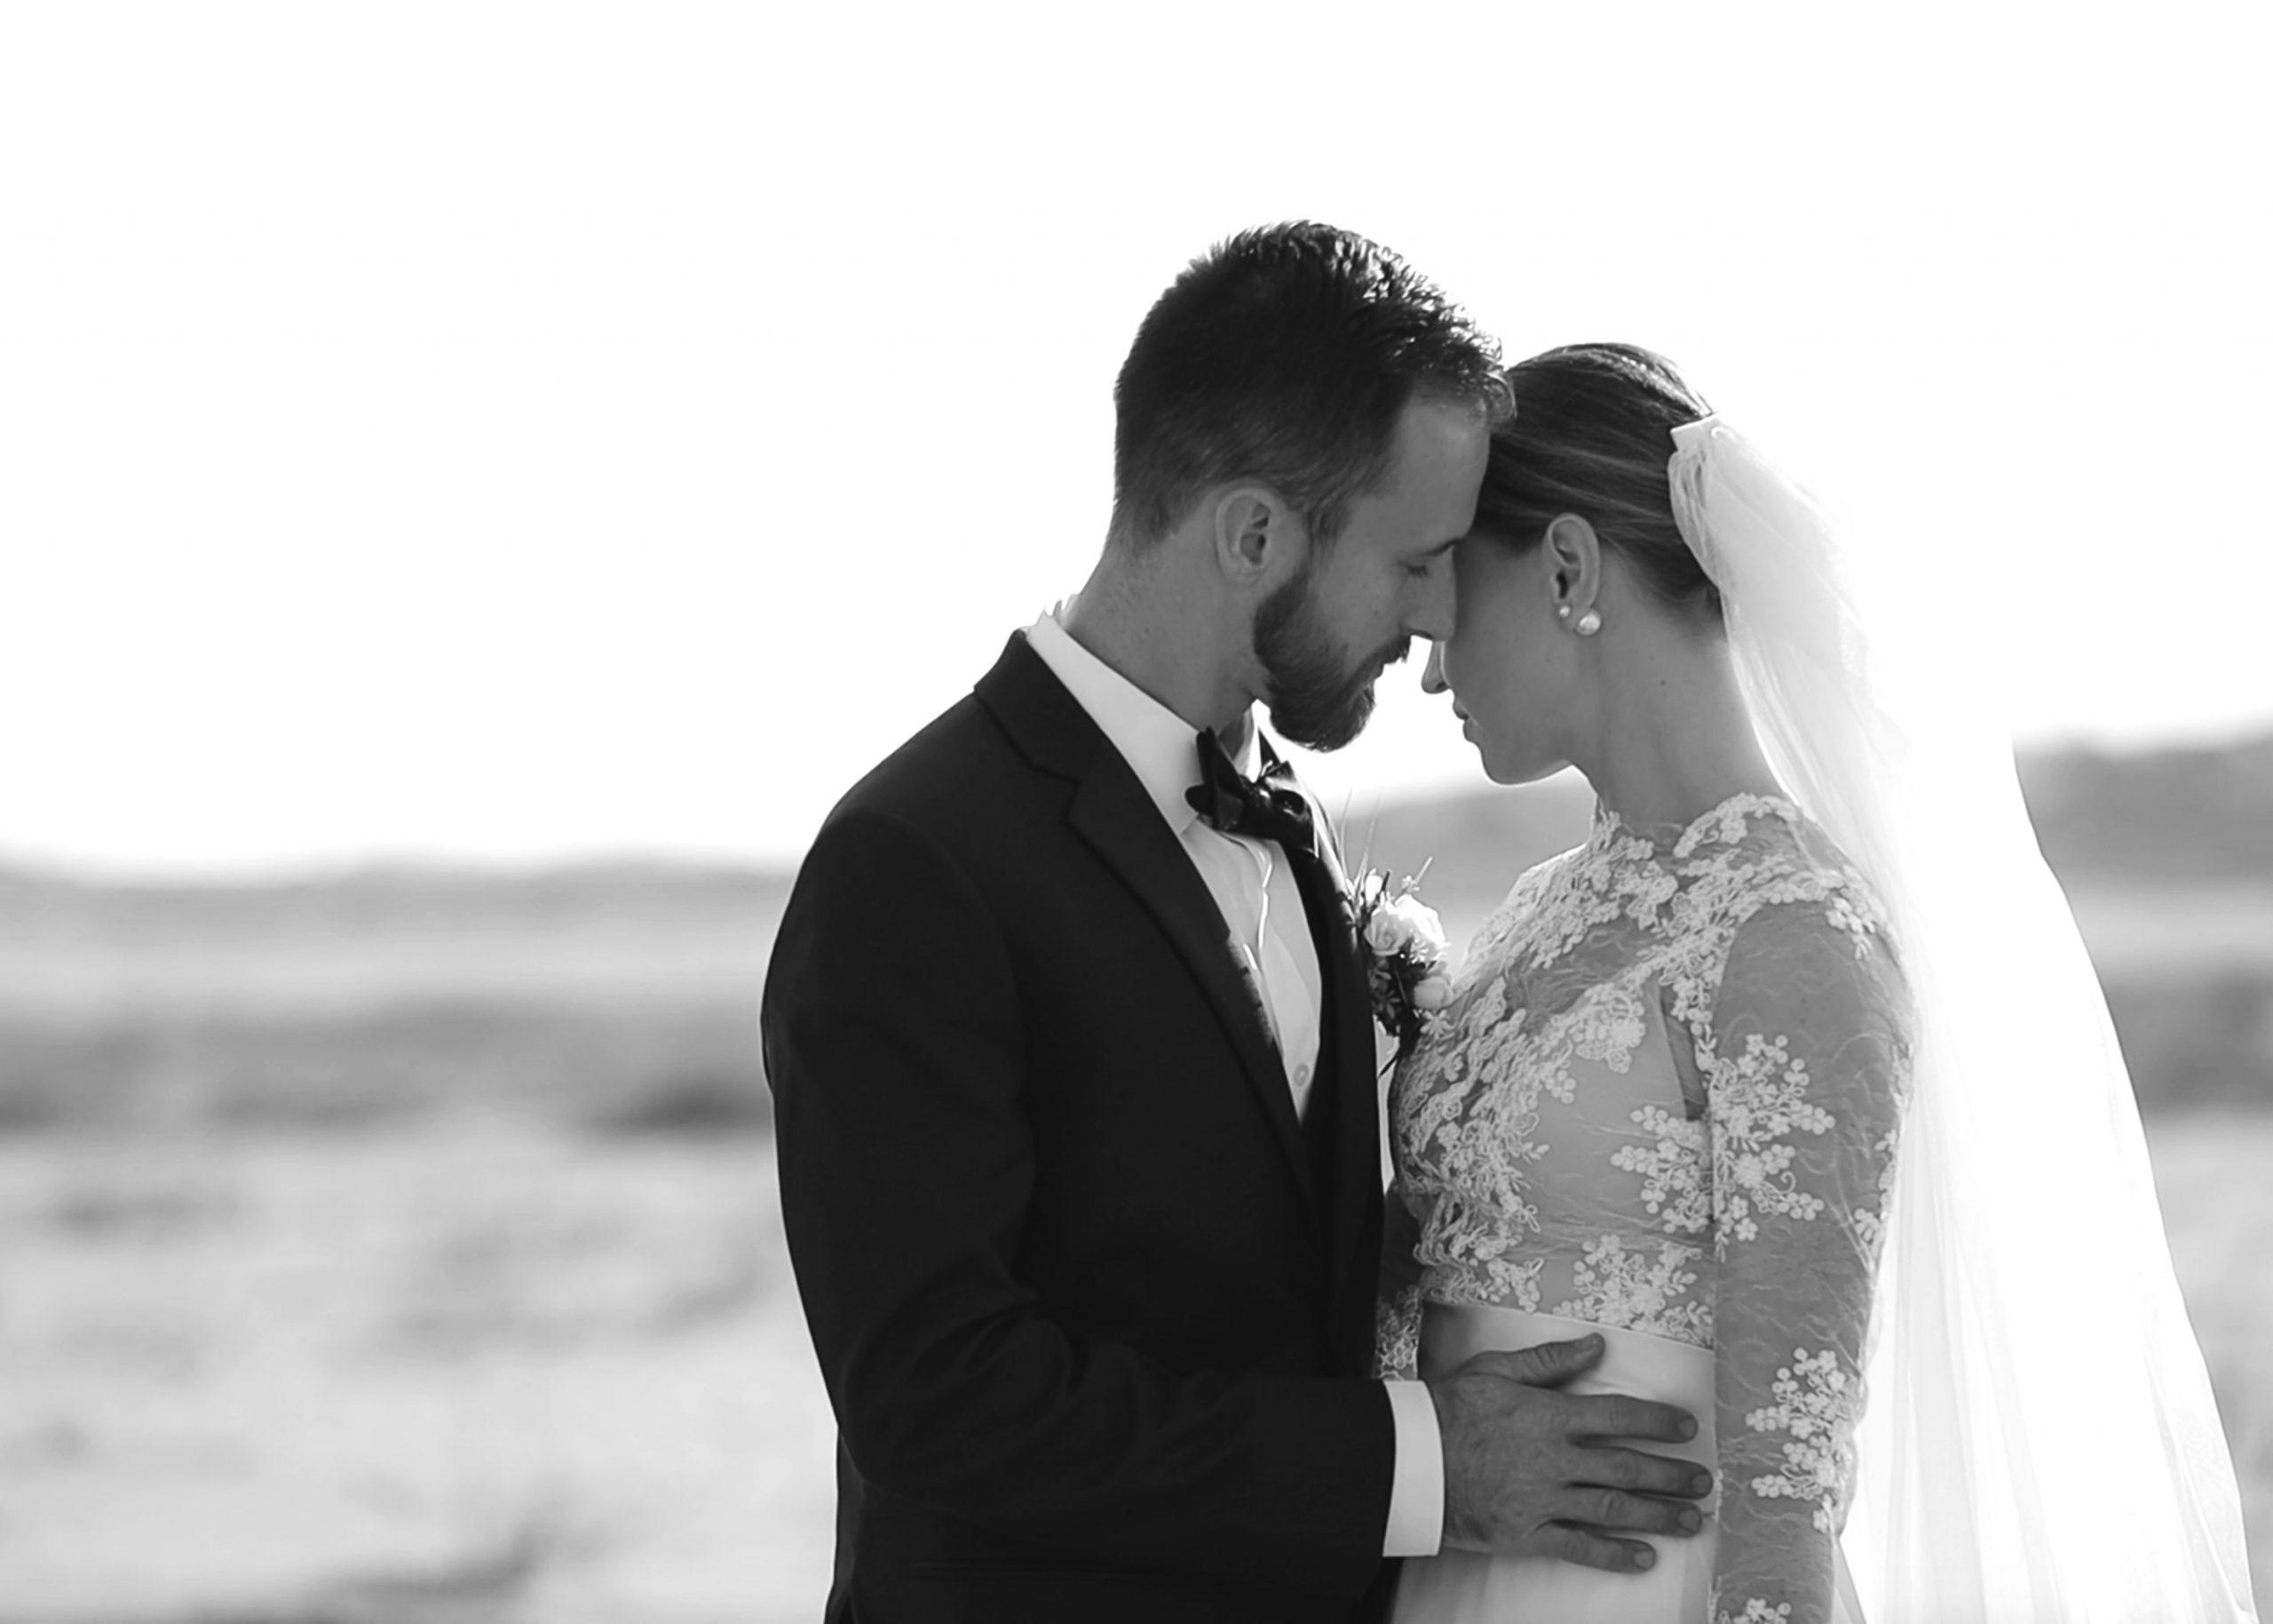 Dubai wedding videographer